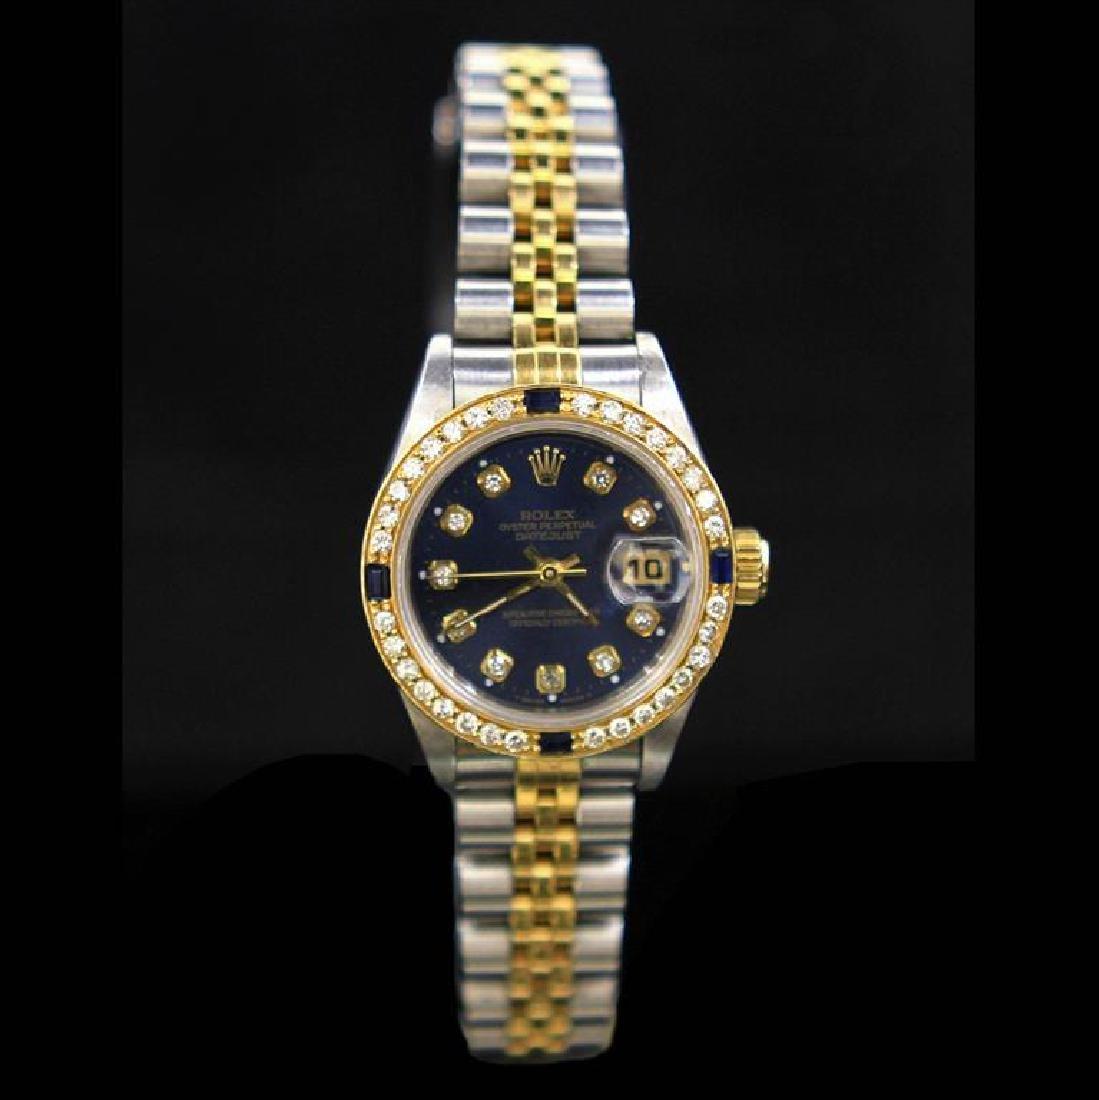 Rolex Two-Tone DateJust 26mm Diamond Dial & Bezel